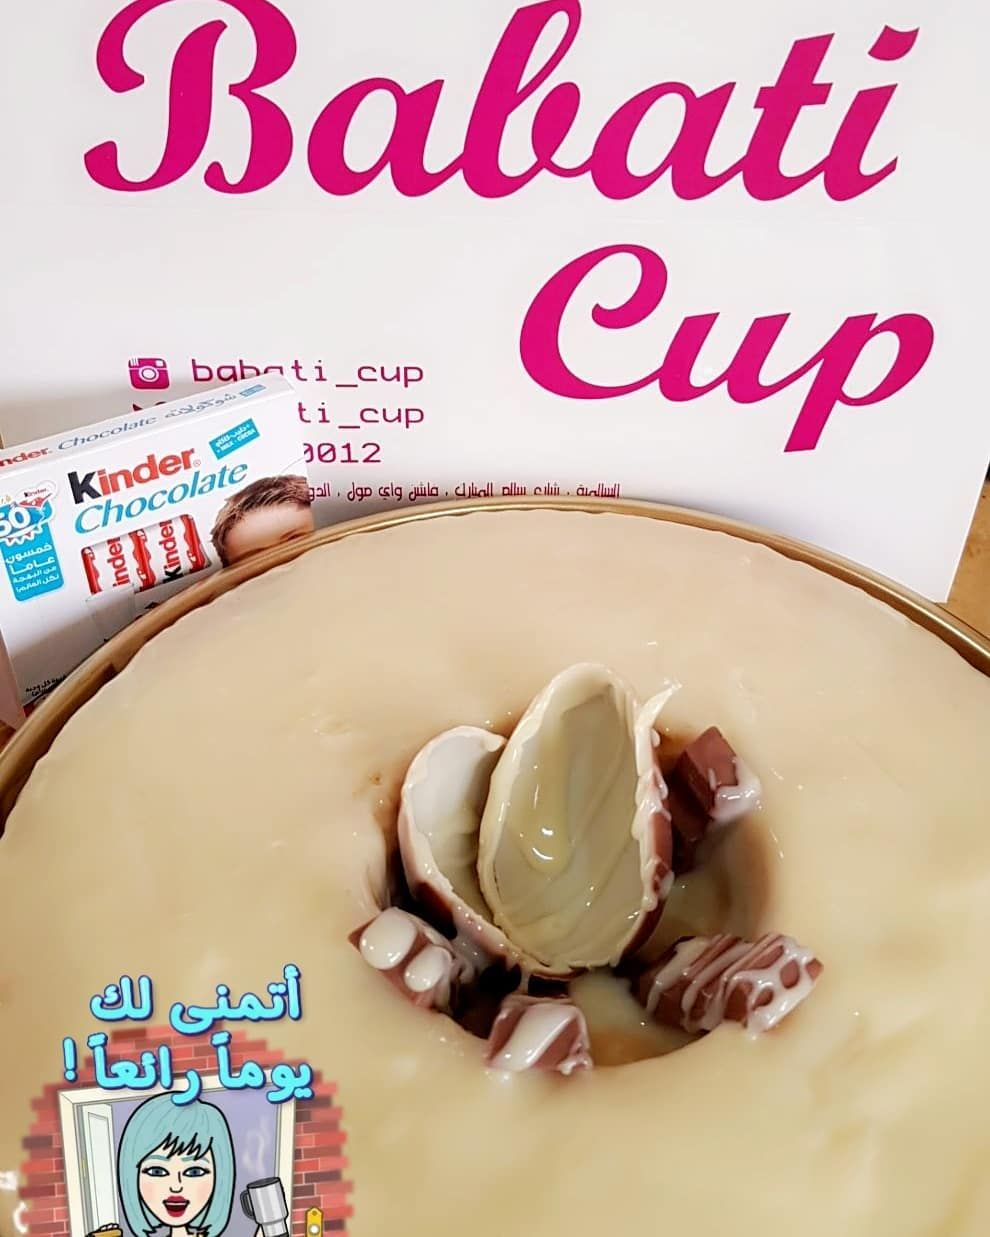 Kuwait Ku Cake Sweet Babati Babati Cup كيك حلويات نوتيلا لوتس كندر سويت قهوه كويت كويتيات توصيل عرض Instagram Posts Food Instagram